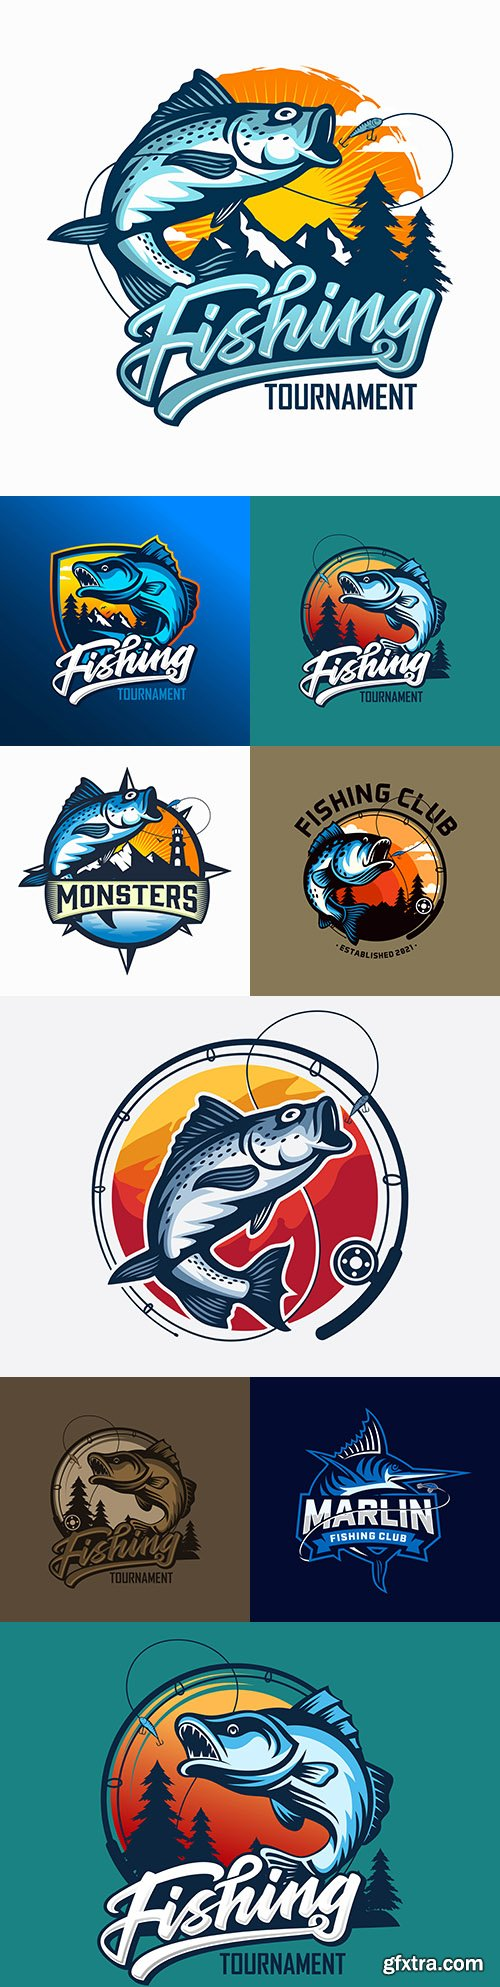 Fishing club logos design company business 2